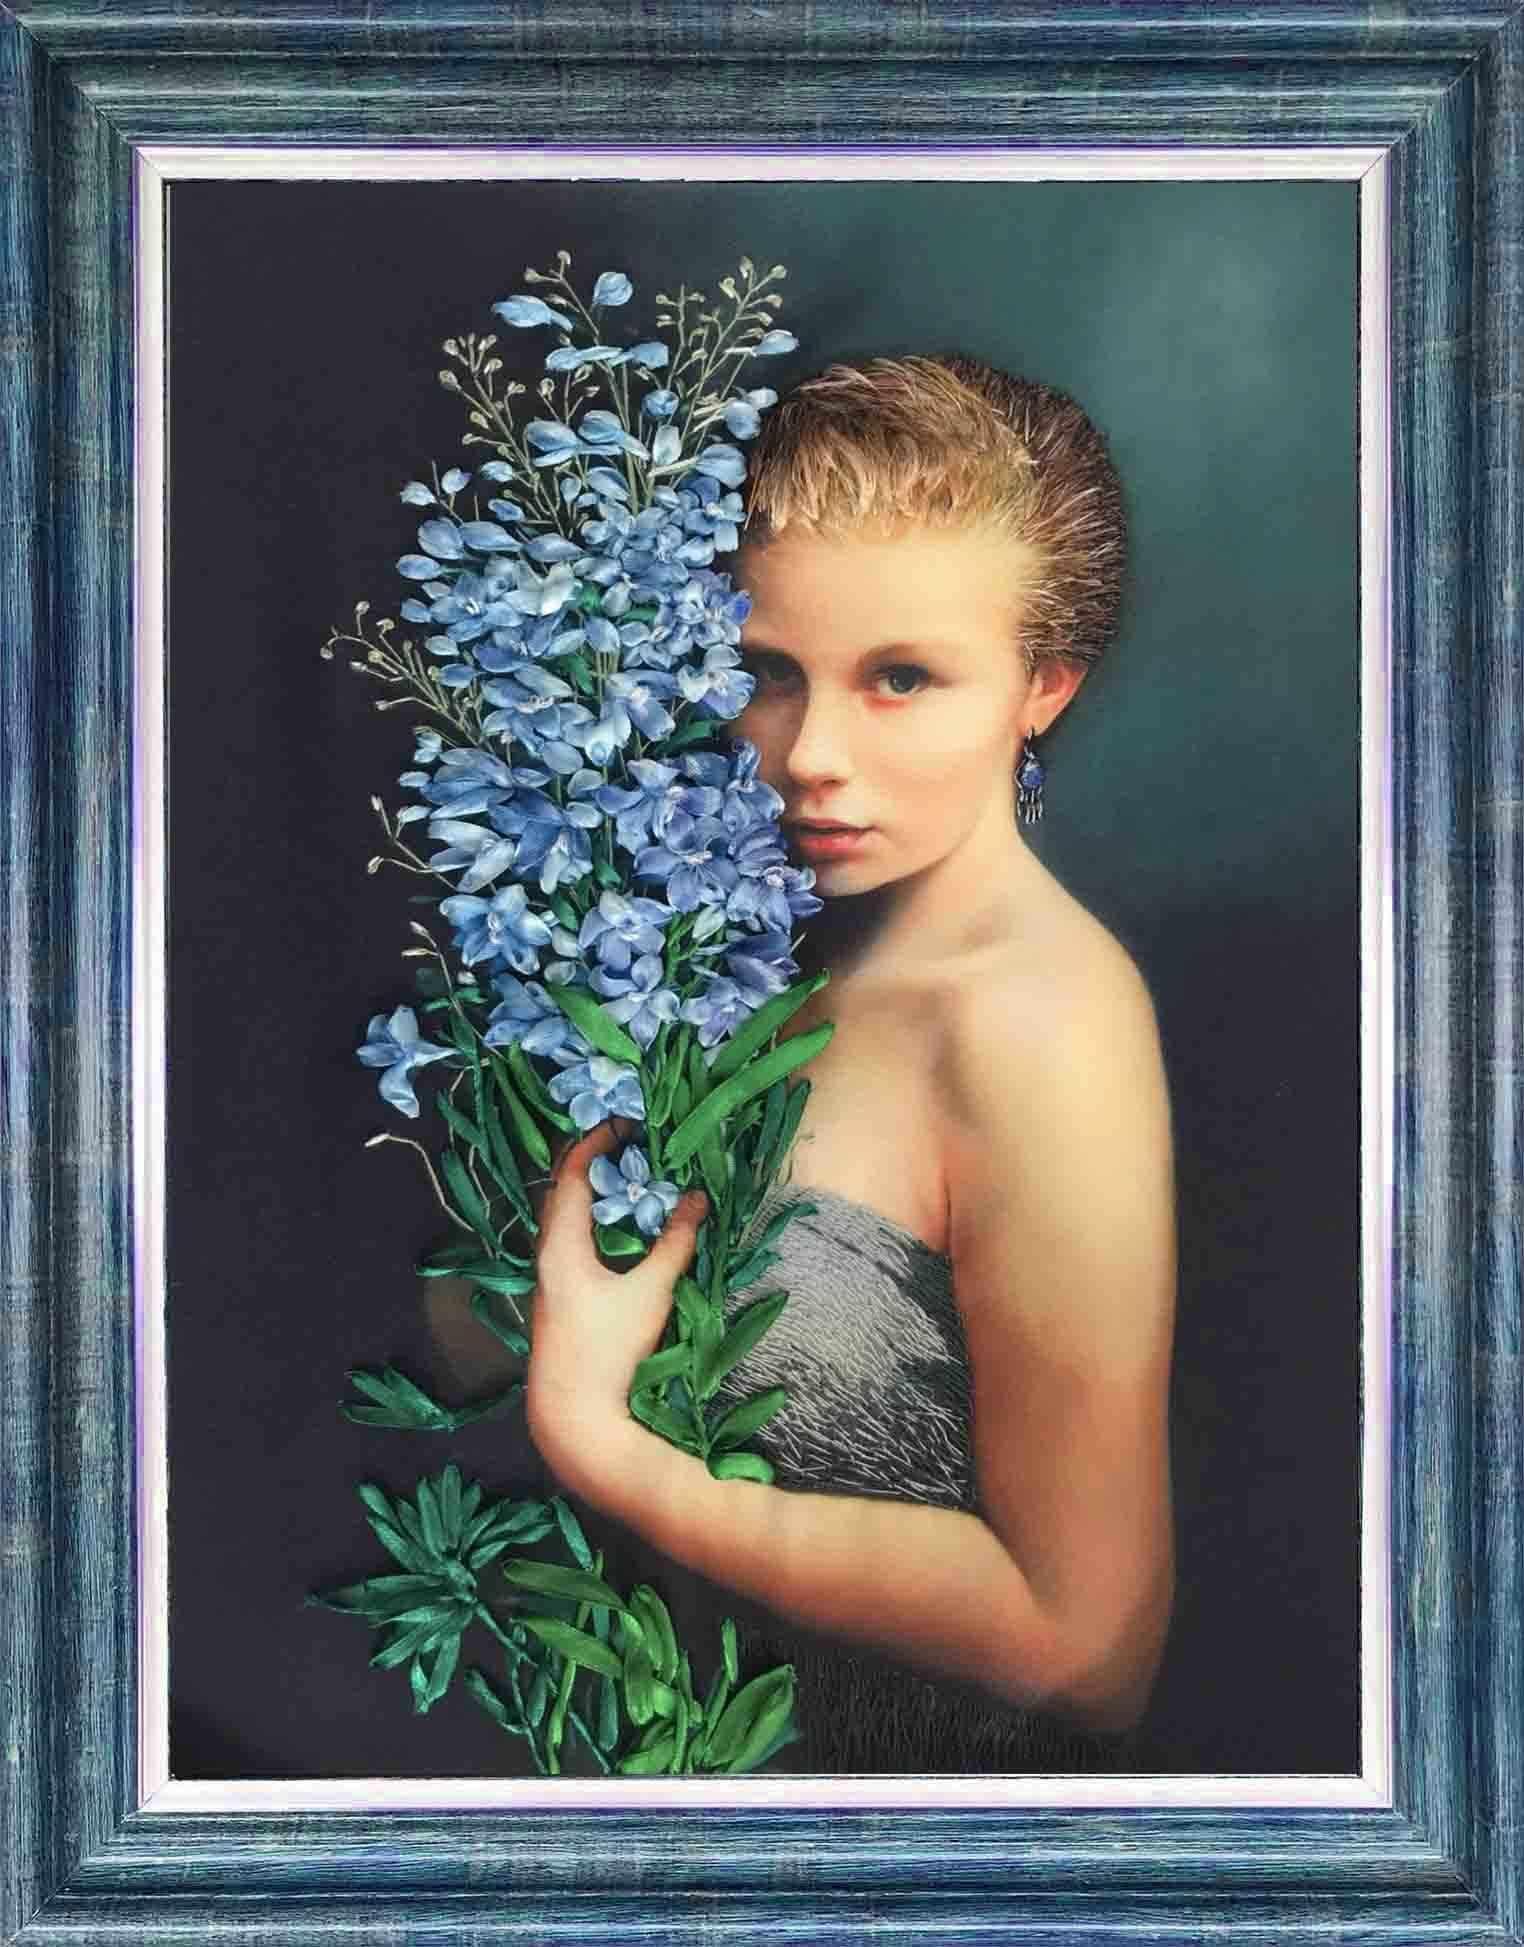 КЛ(н) 3025 Девушка с васильками - набор (Каролинка)